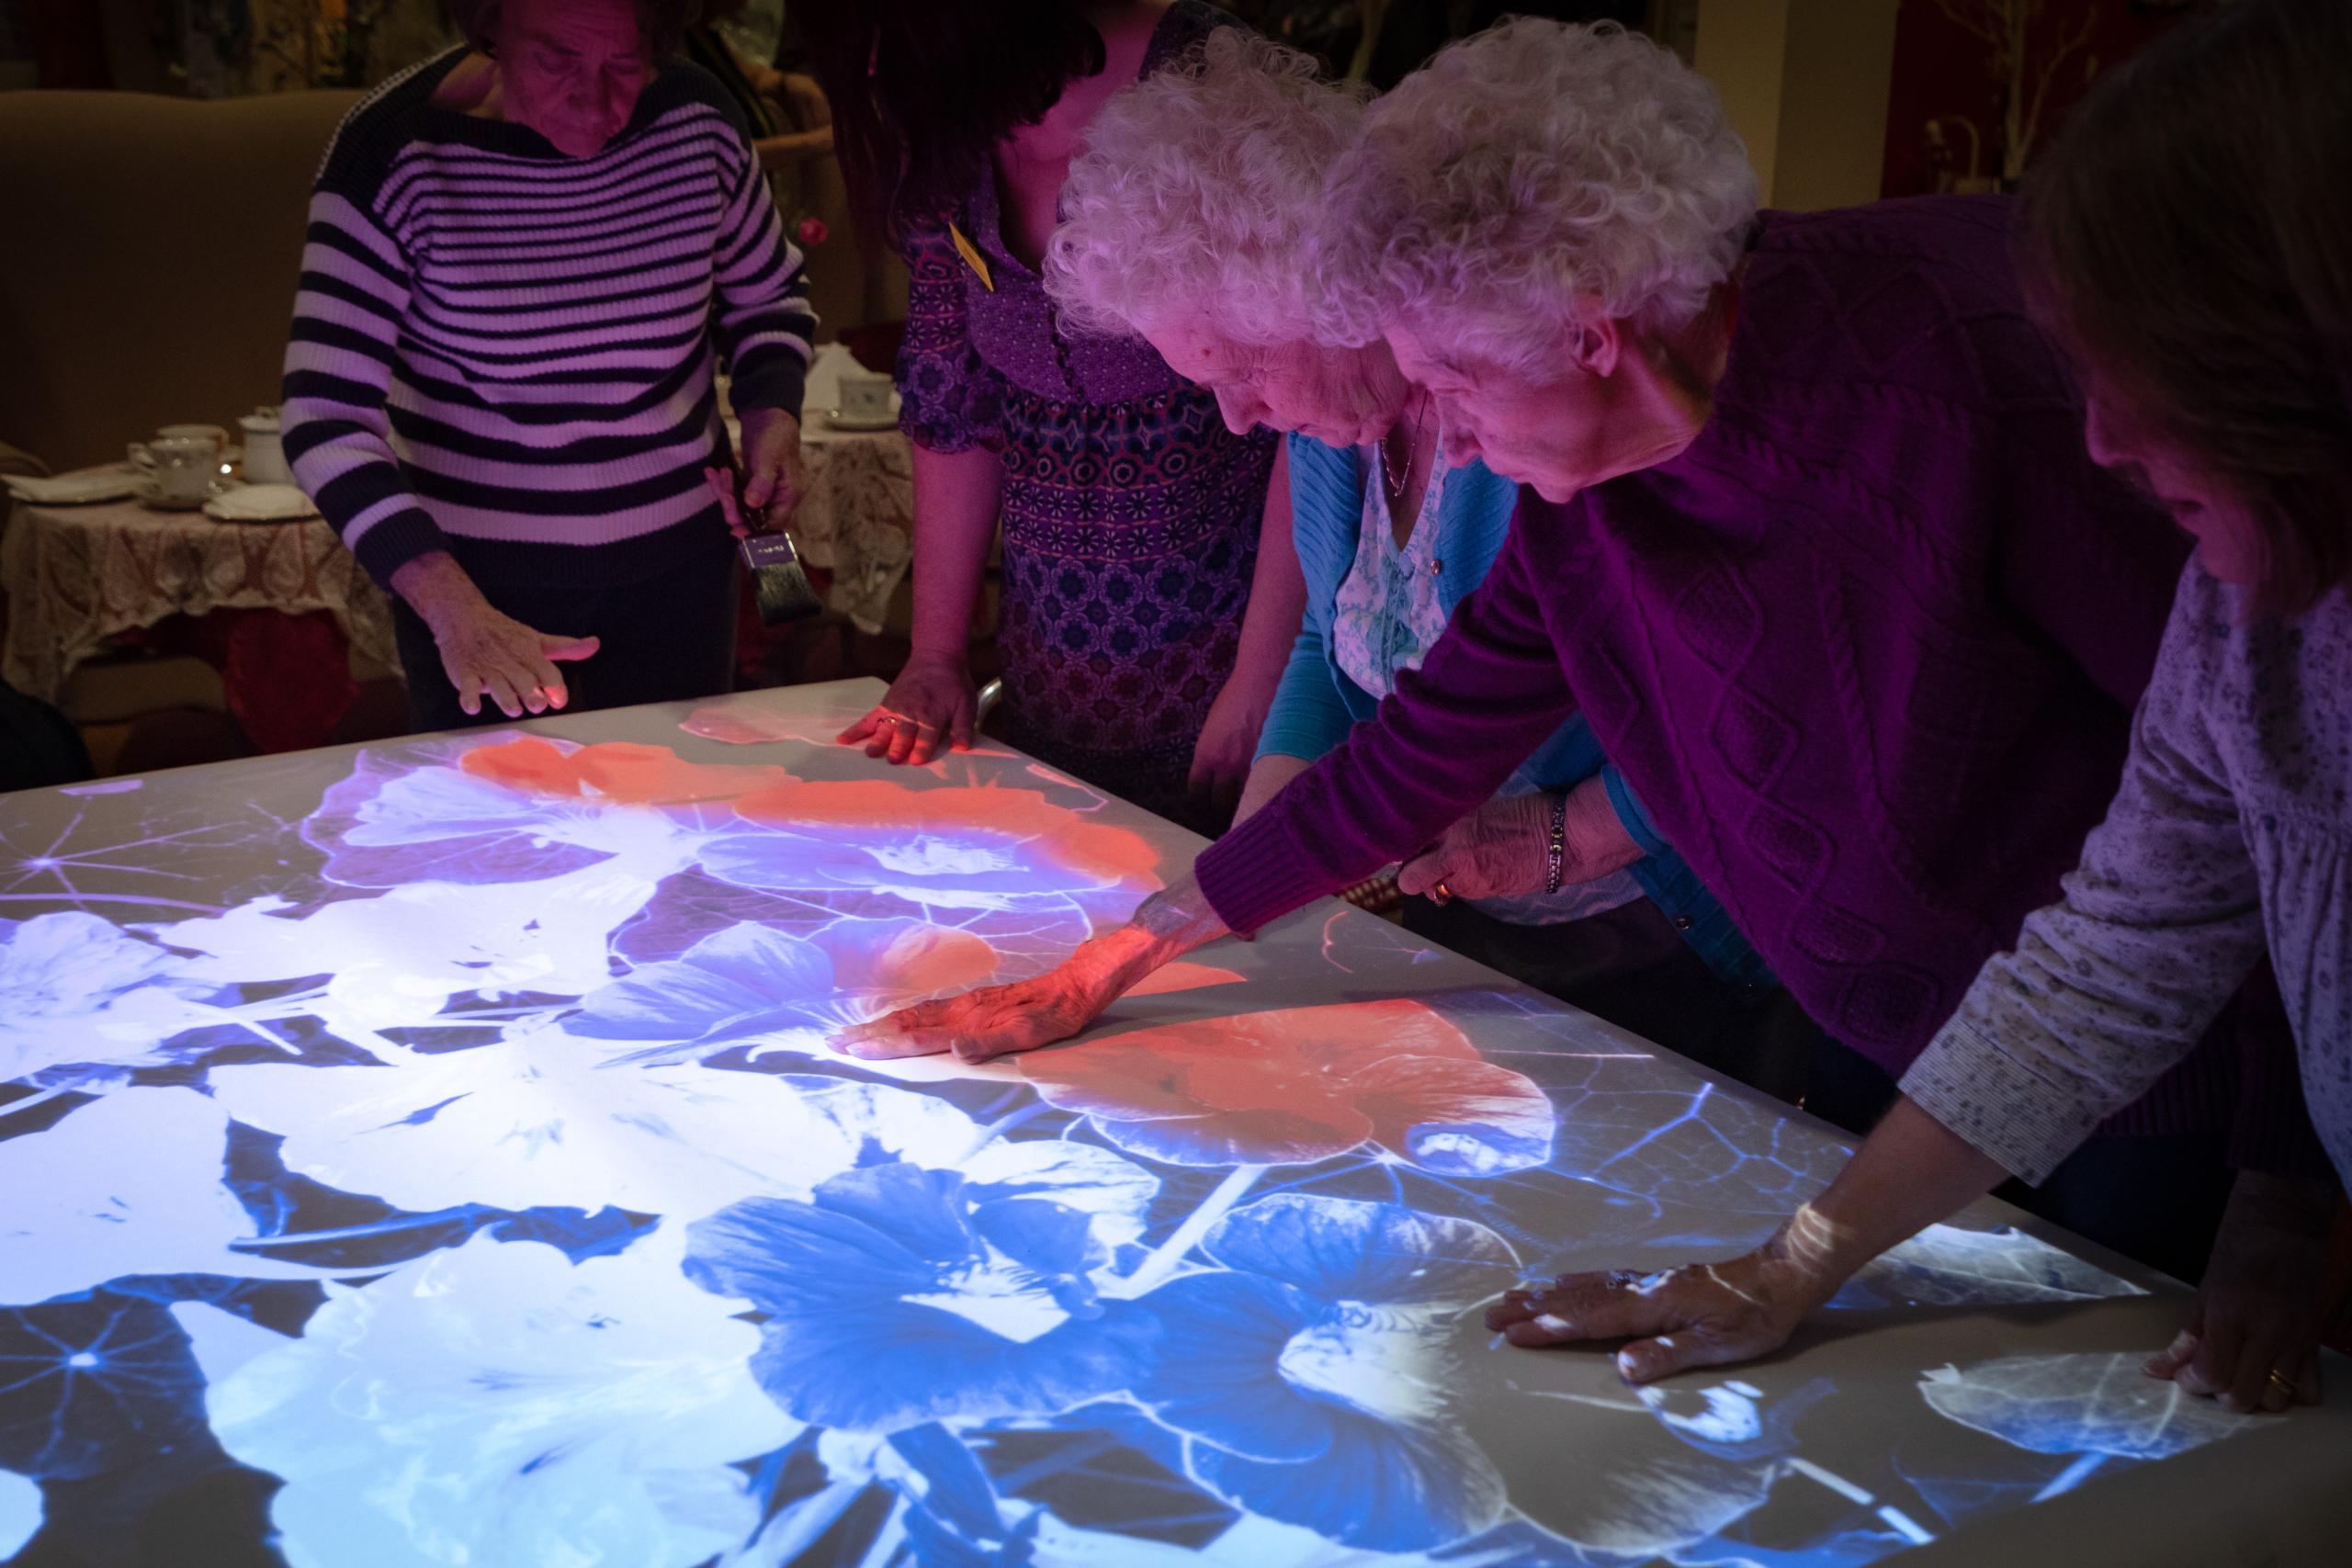 carey lodge residents enjoying sensory table top painting activities